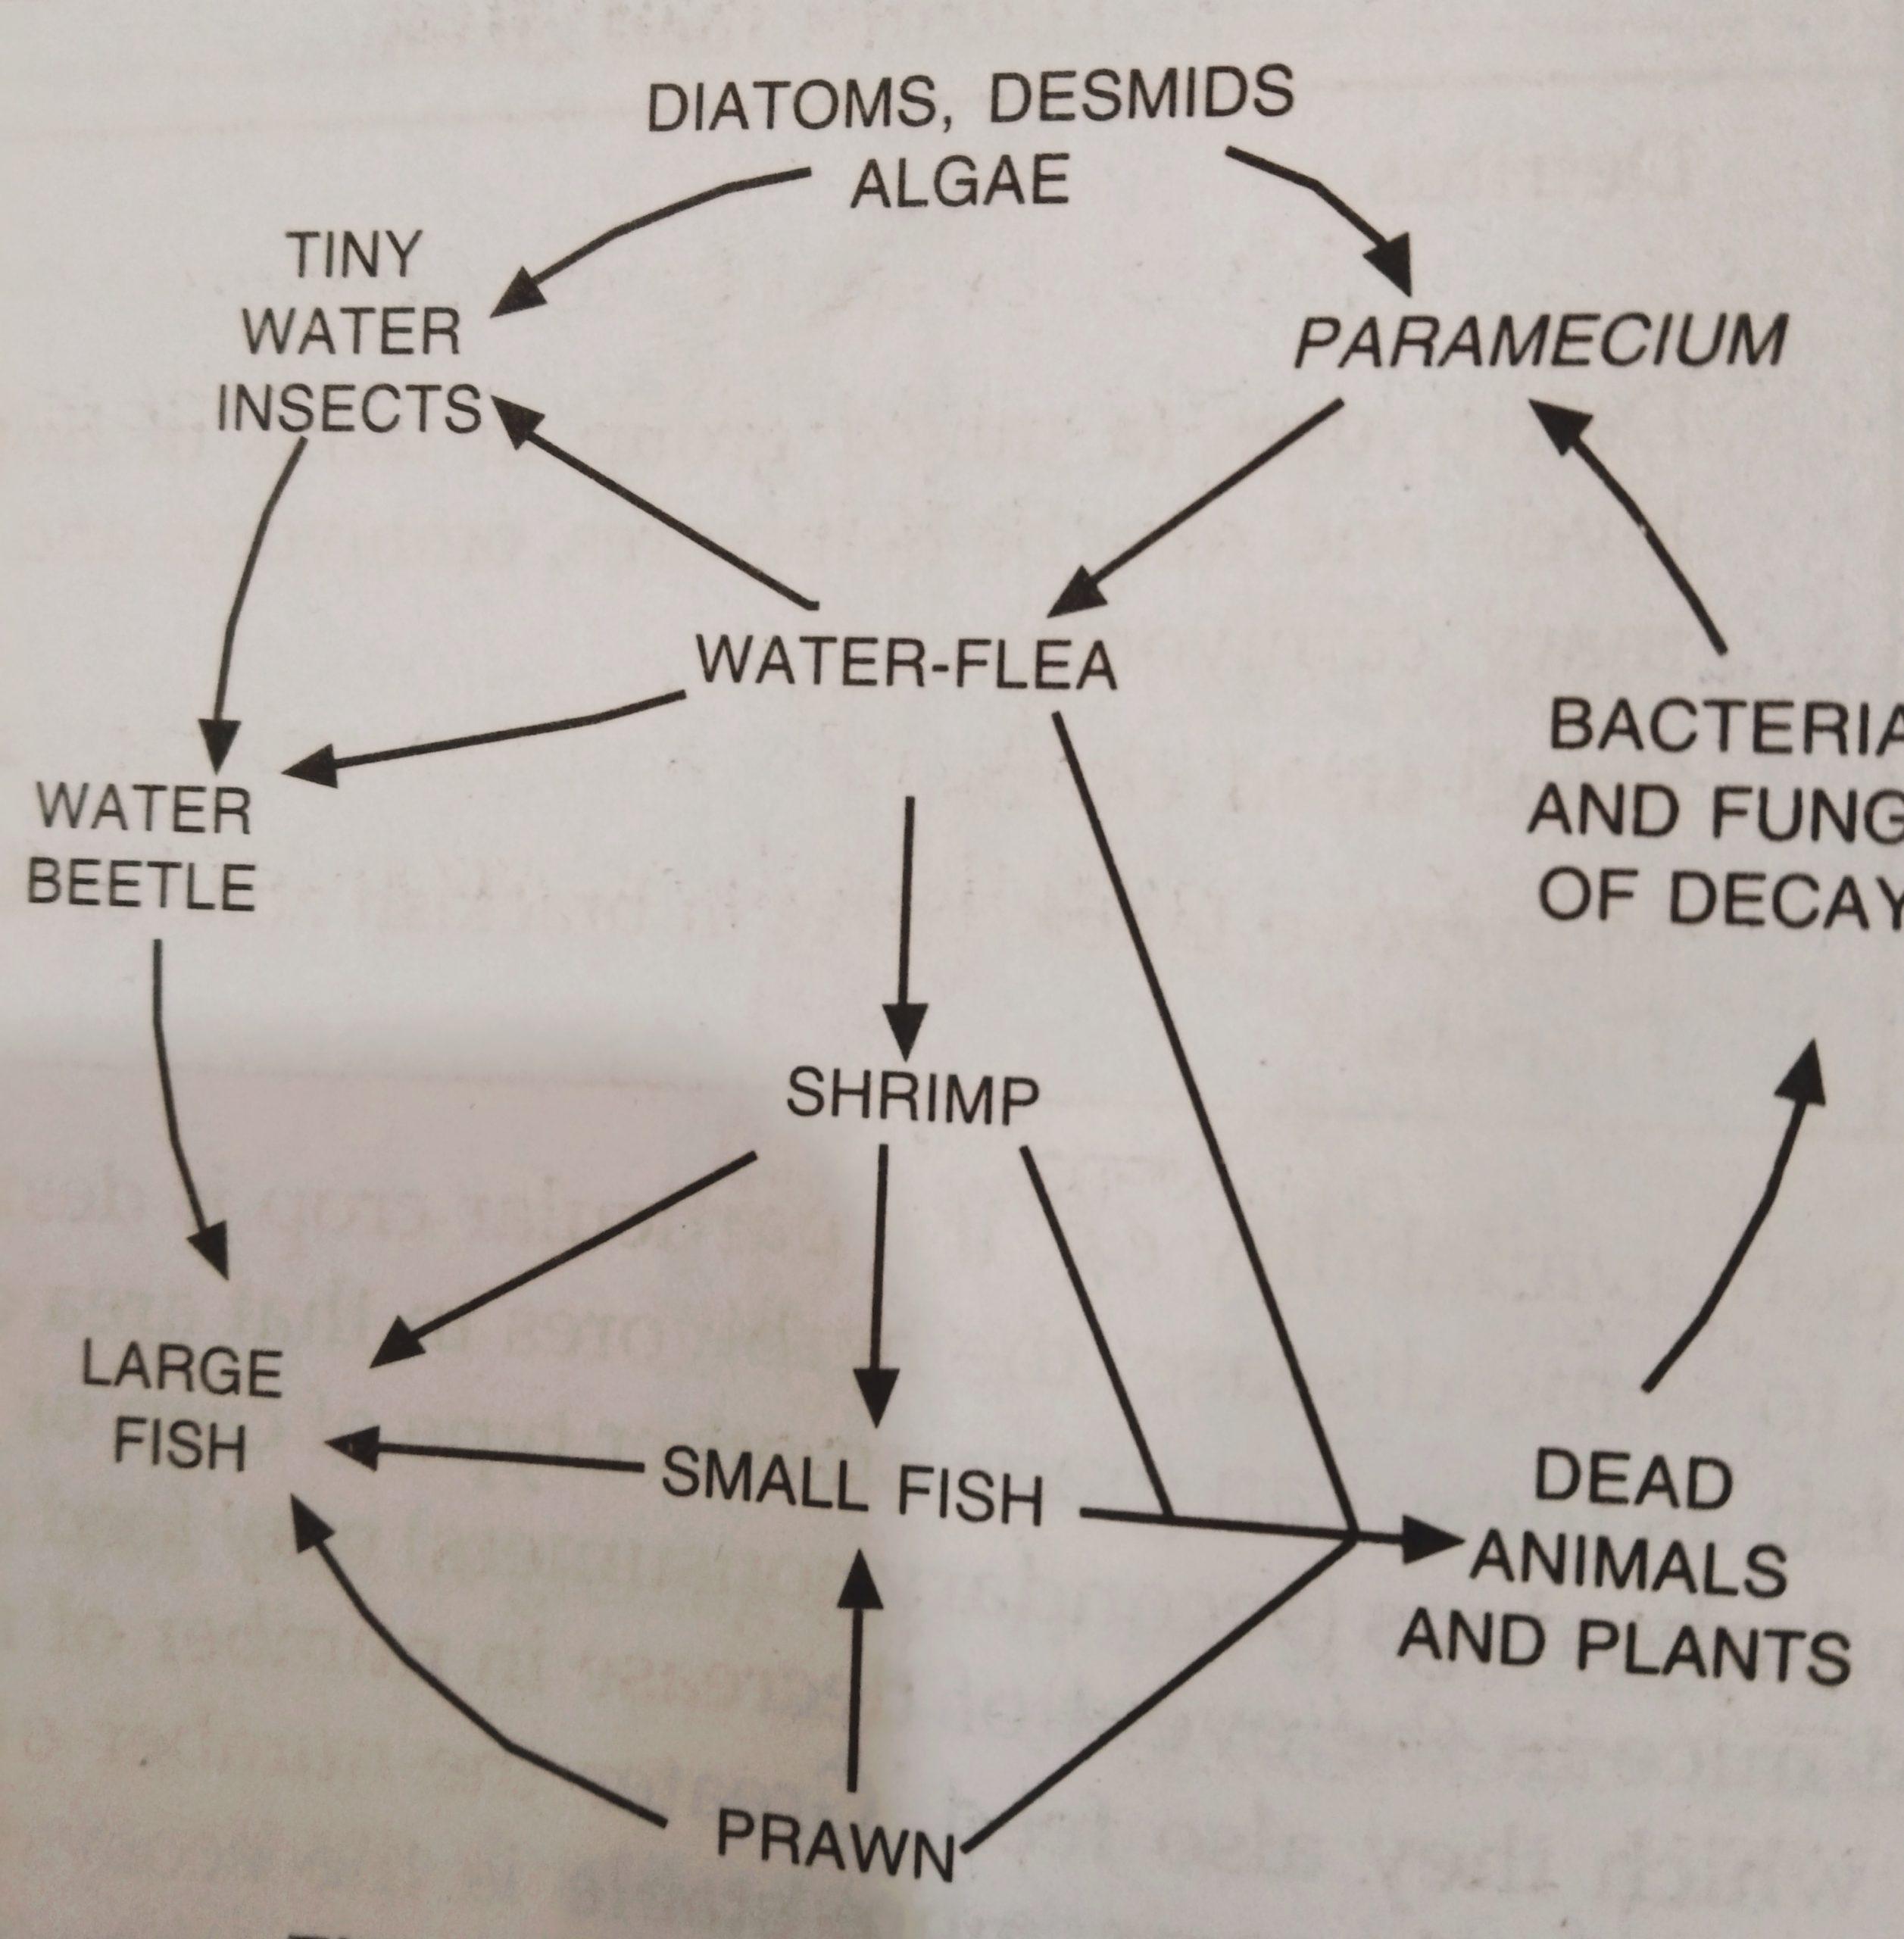 Food web diagram in a pond